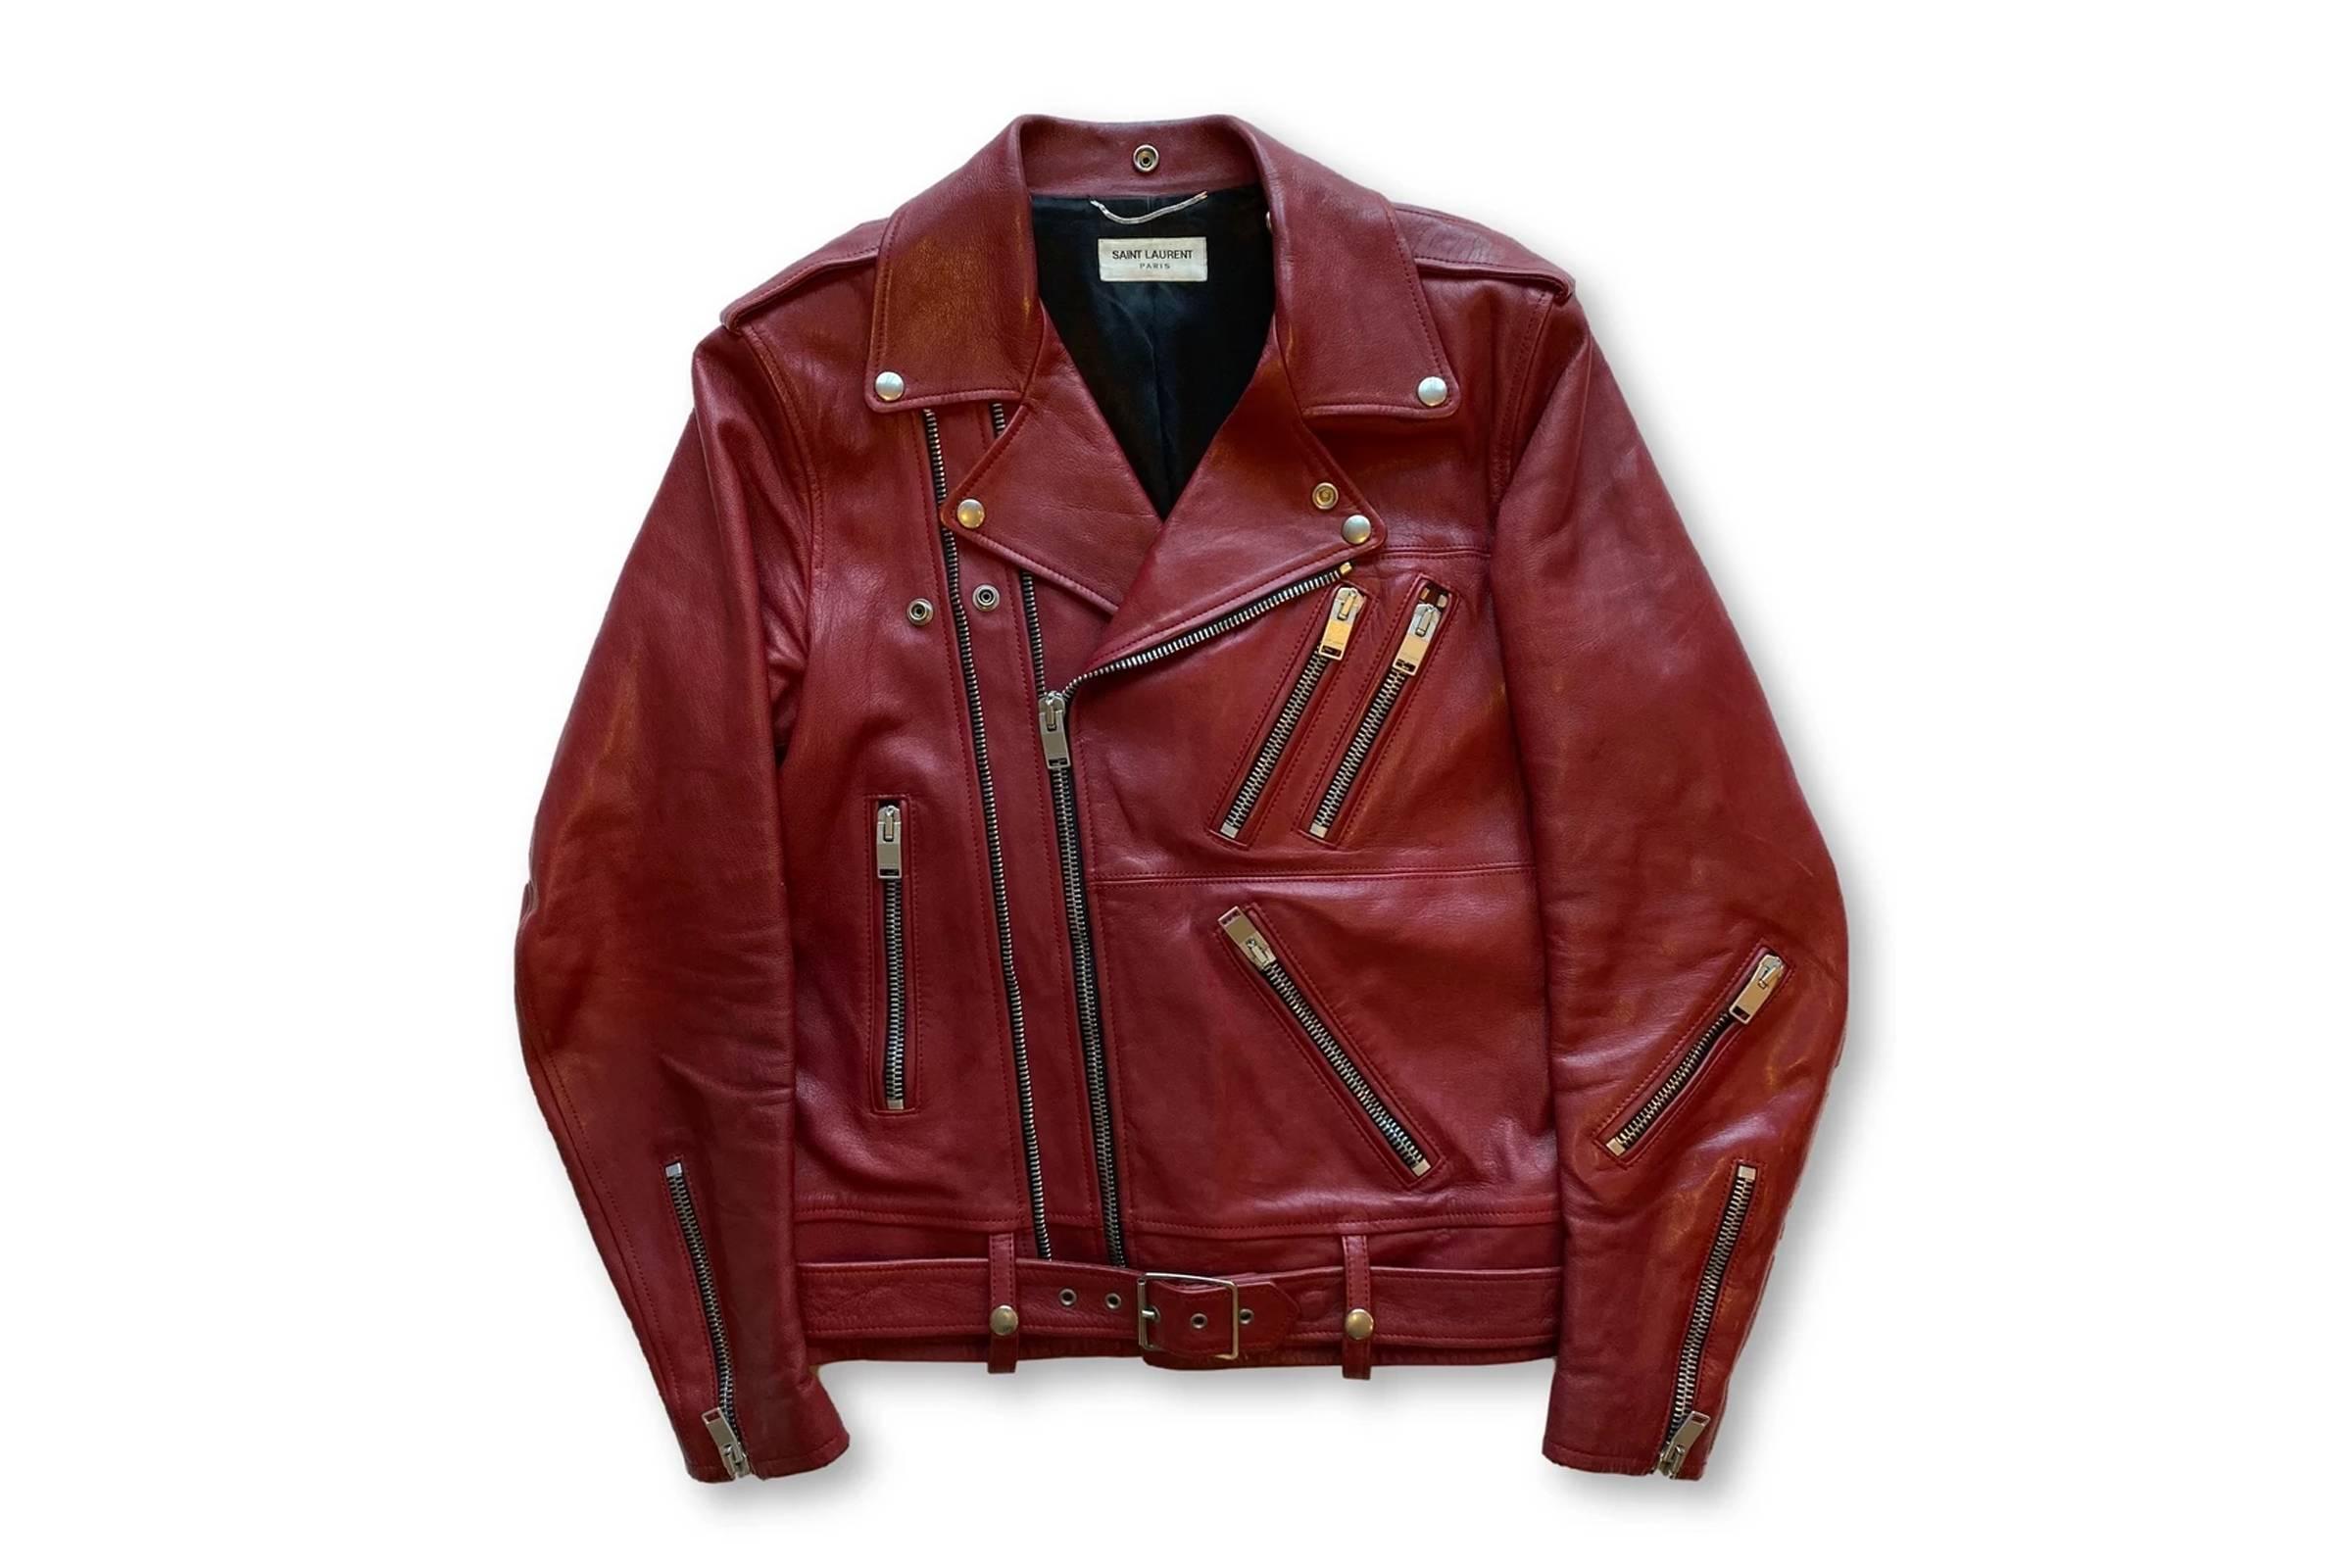 Saint Laurent Paris Red Leather Double Zip Biker Jacket